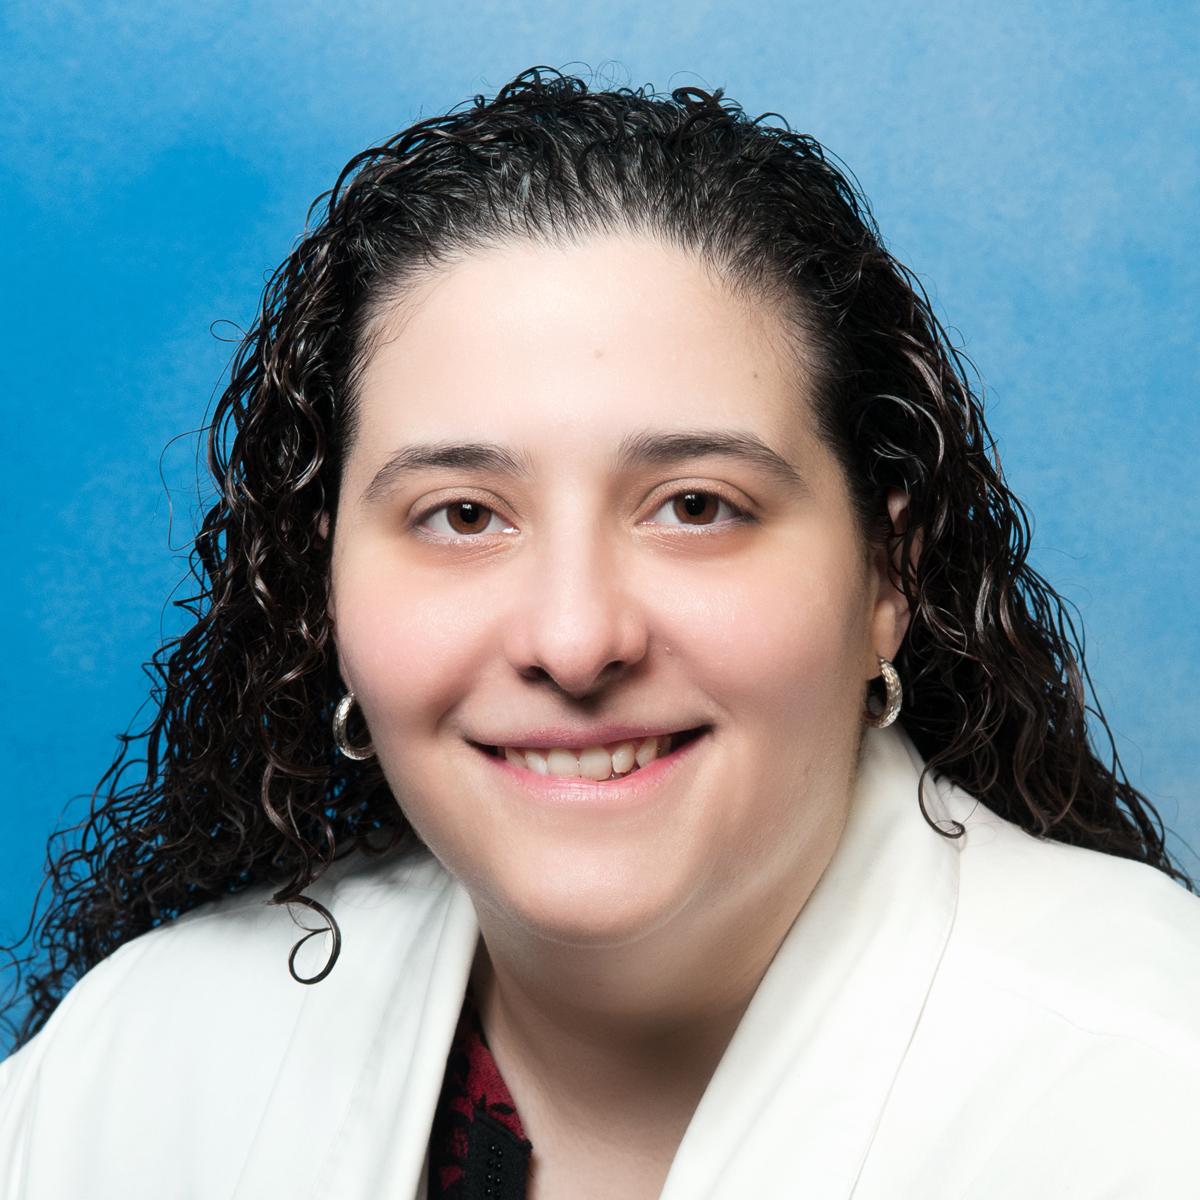 Susan Baroody, DO - The Wright Center